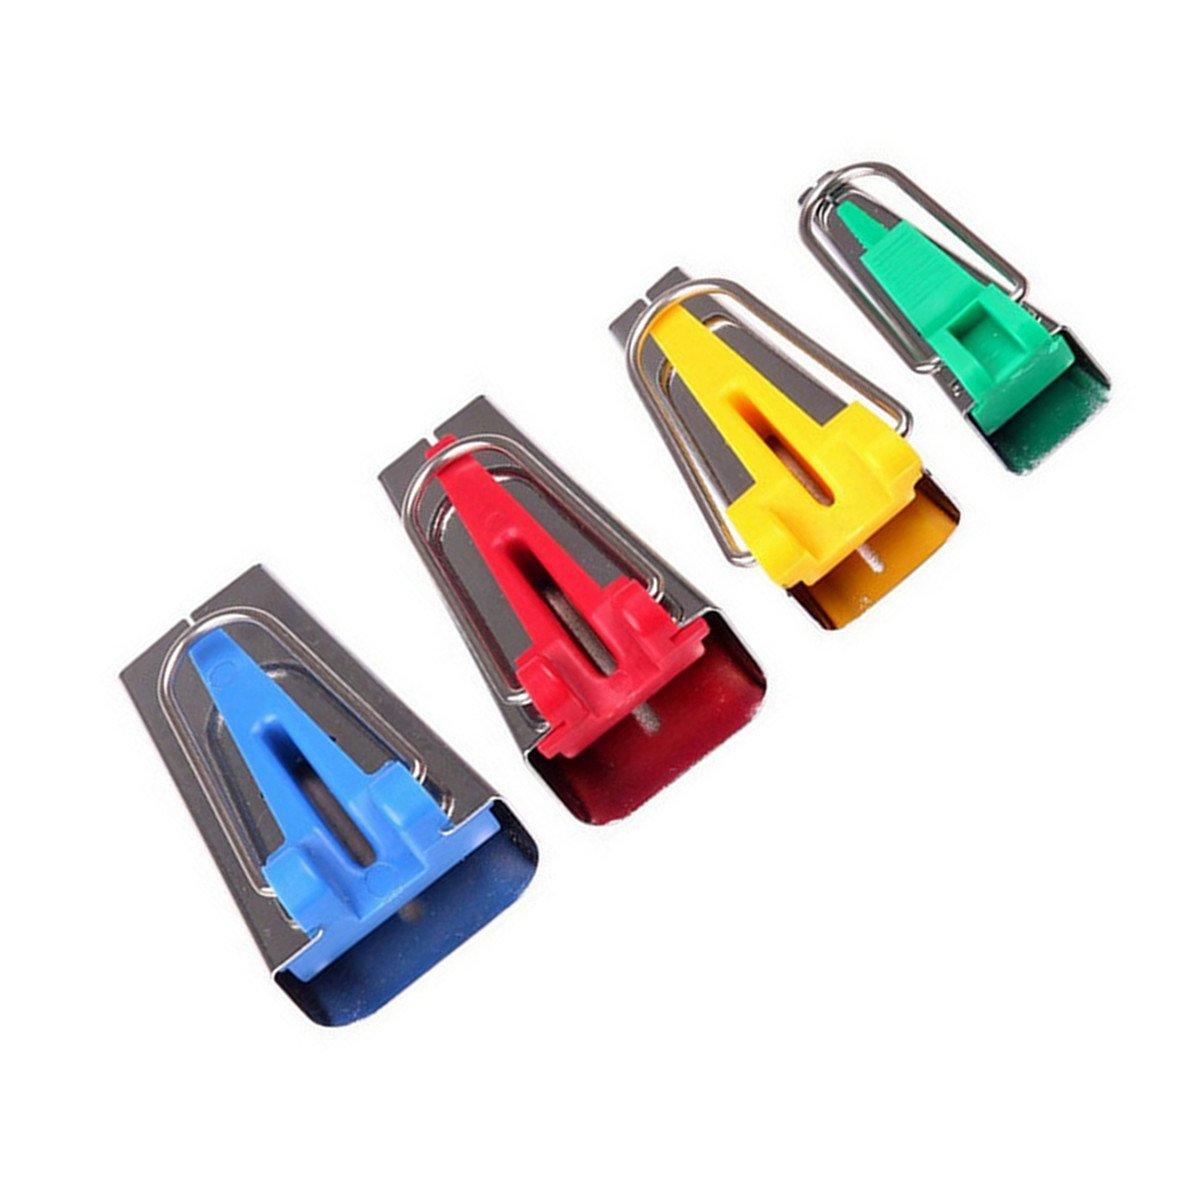 Homiki. Lote de 4 herramientas para bies/bandas de tela de tamañ os diferentes para anchuras de 6 mm 12 mm 18 mm 25 mm PG